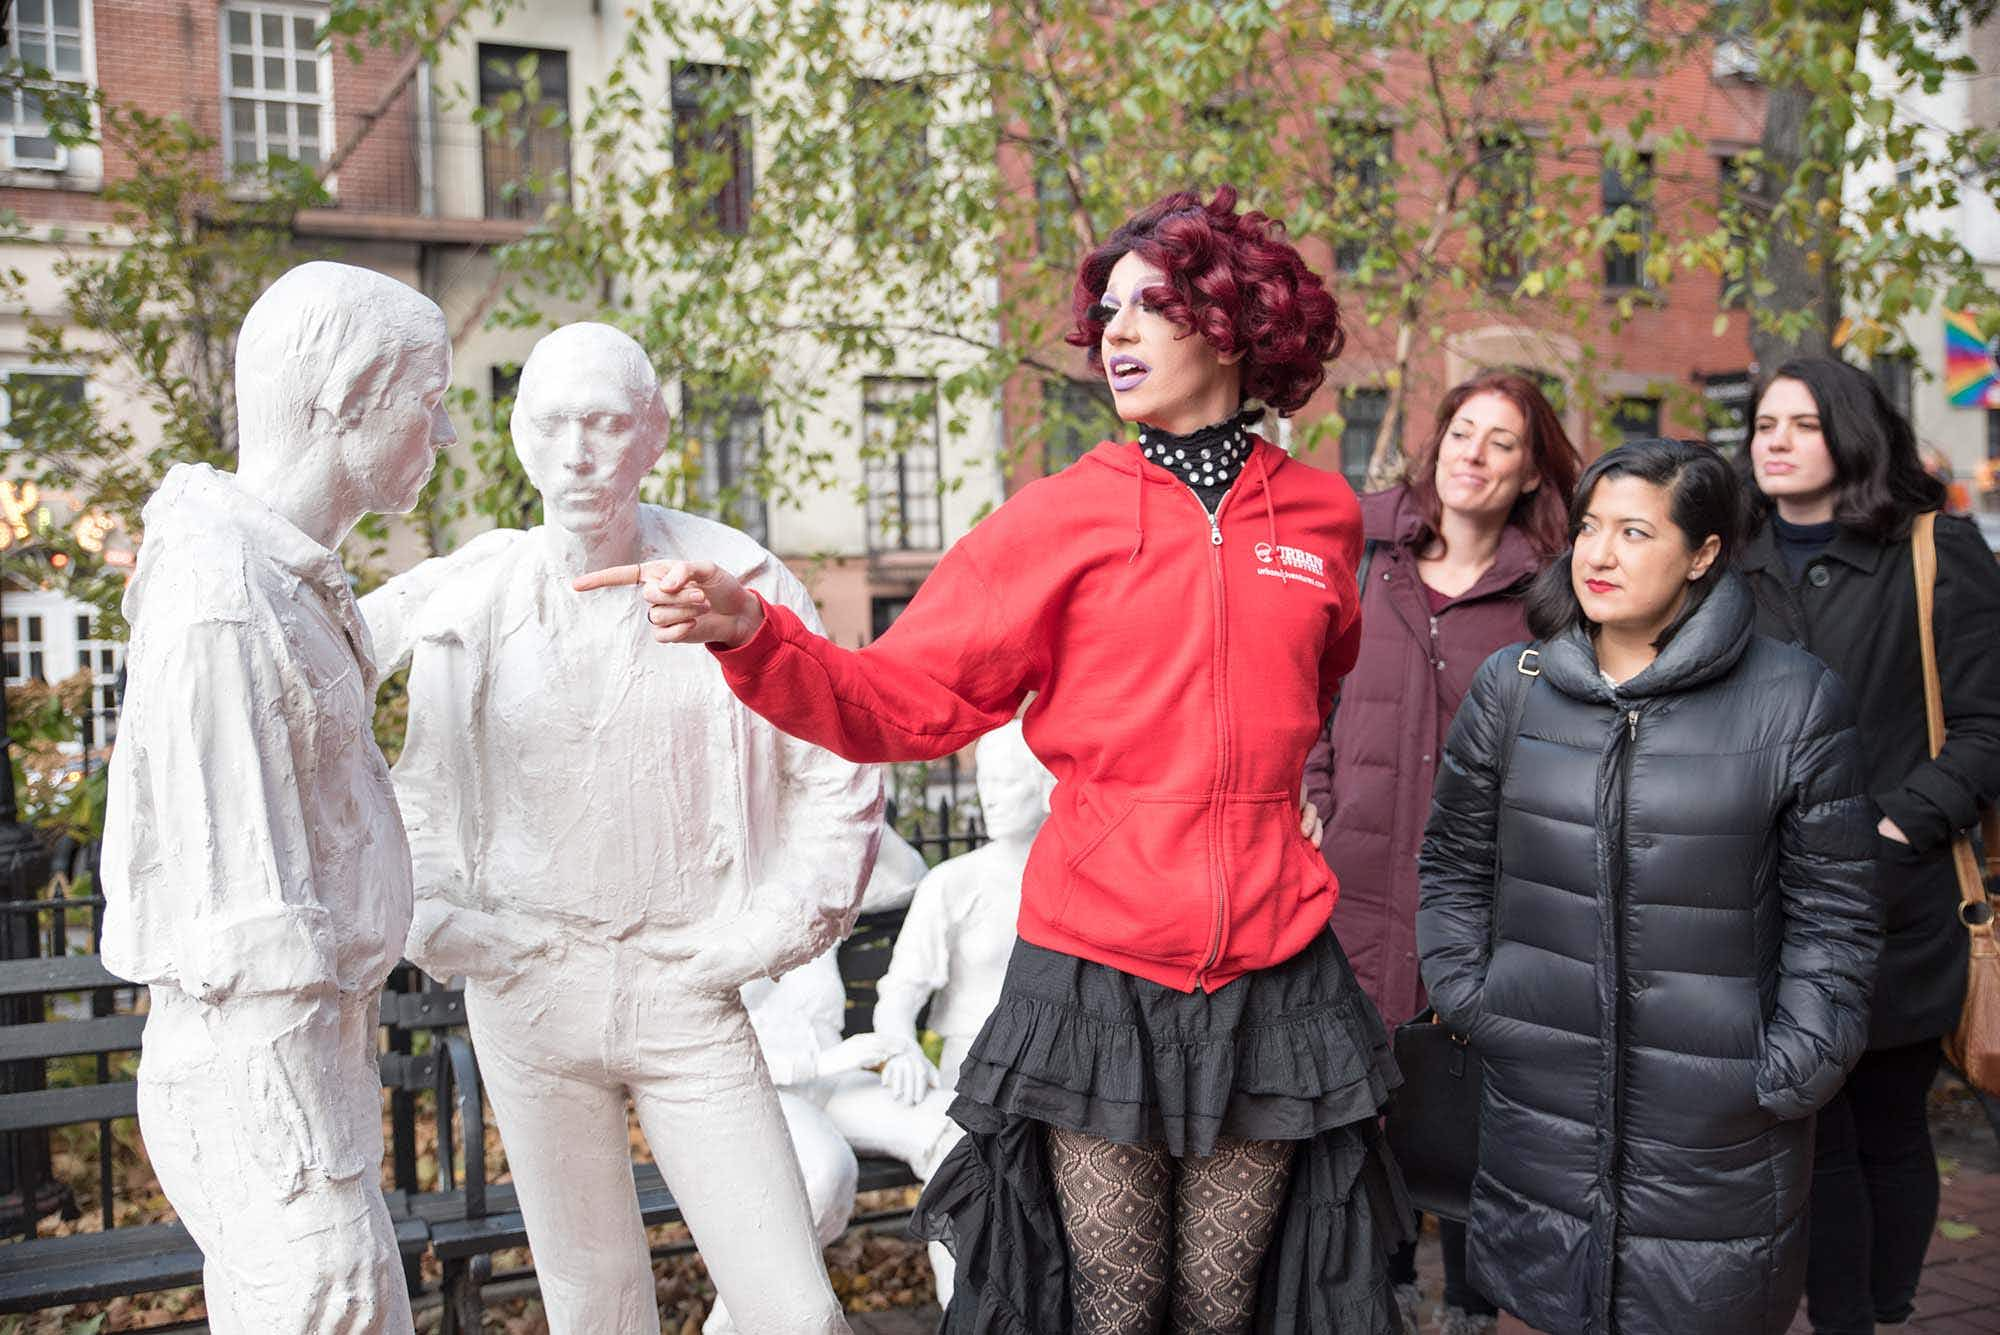 This new tour takes you through New York's LGBTQ+ history